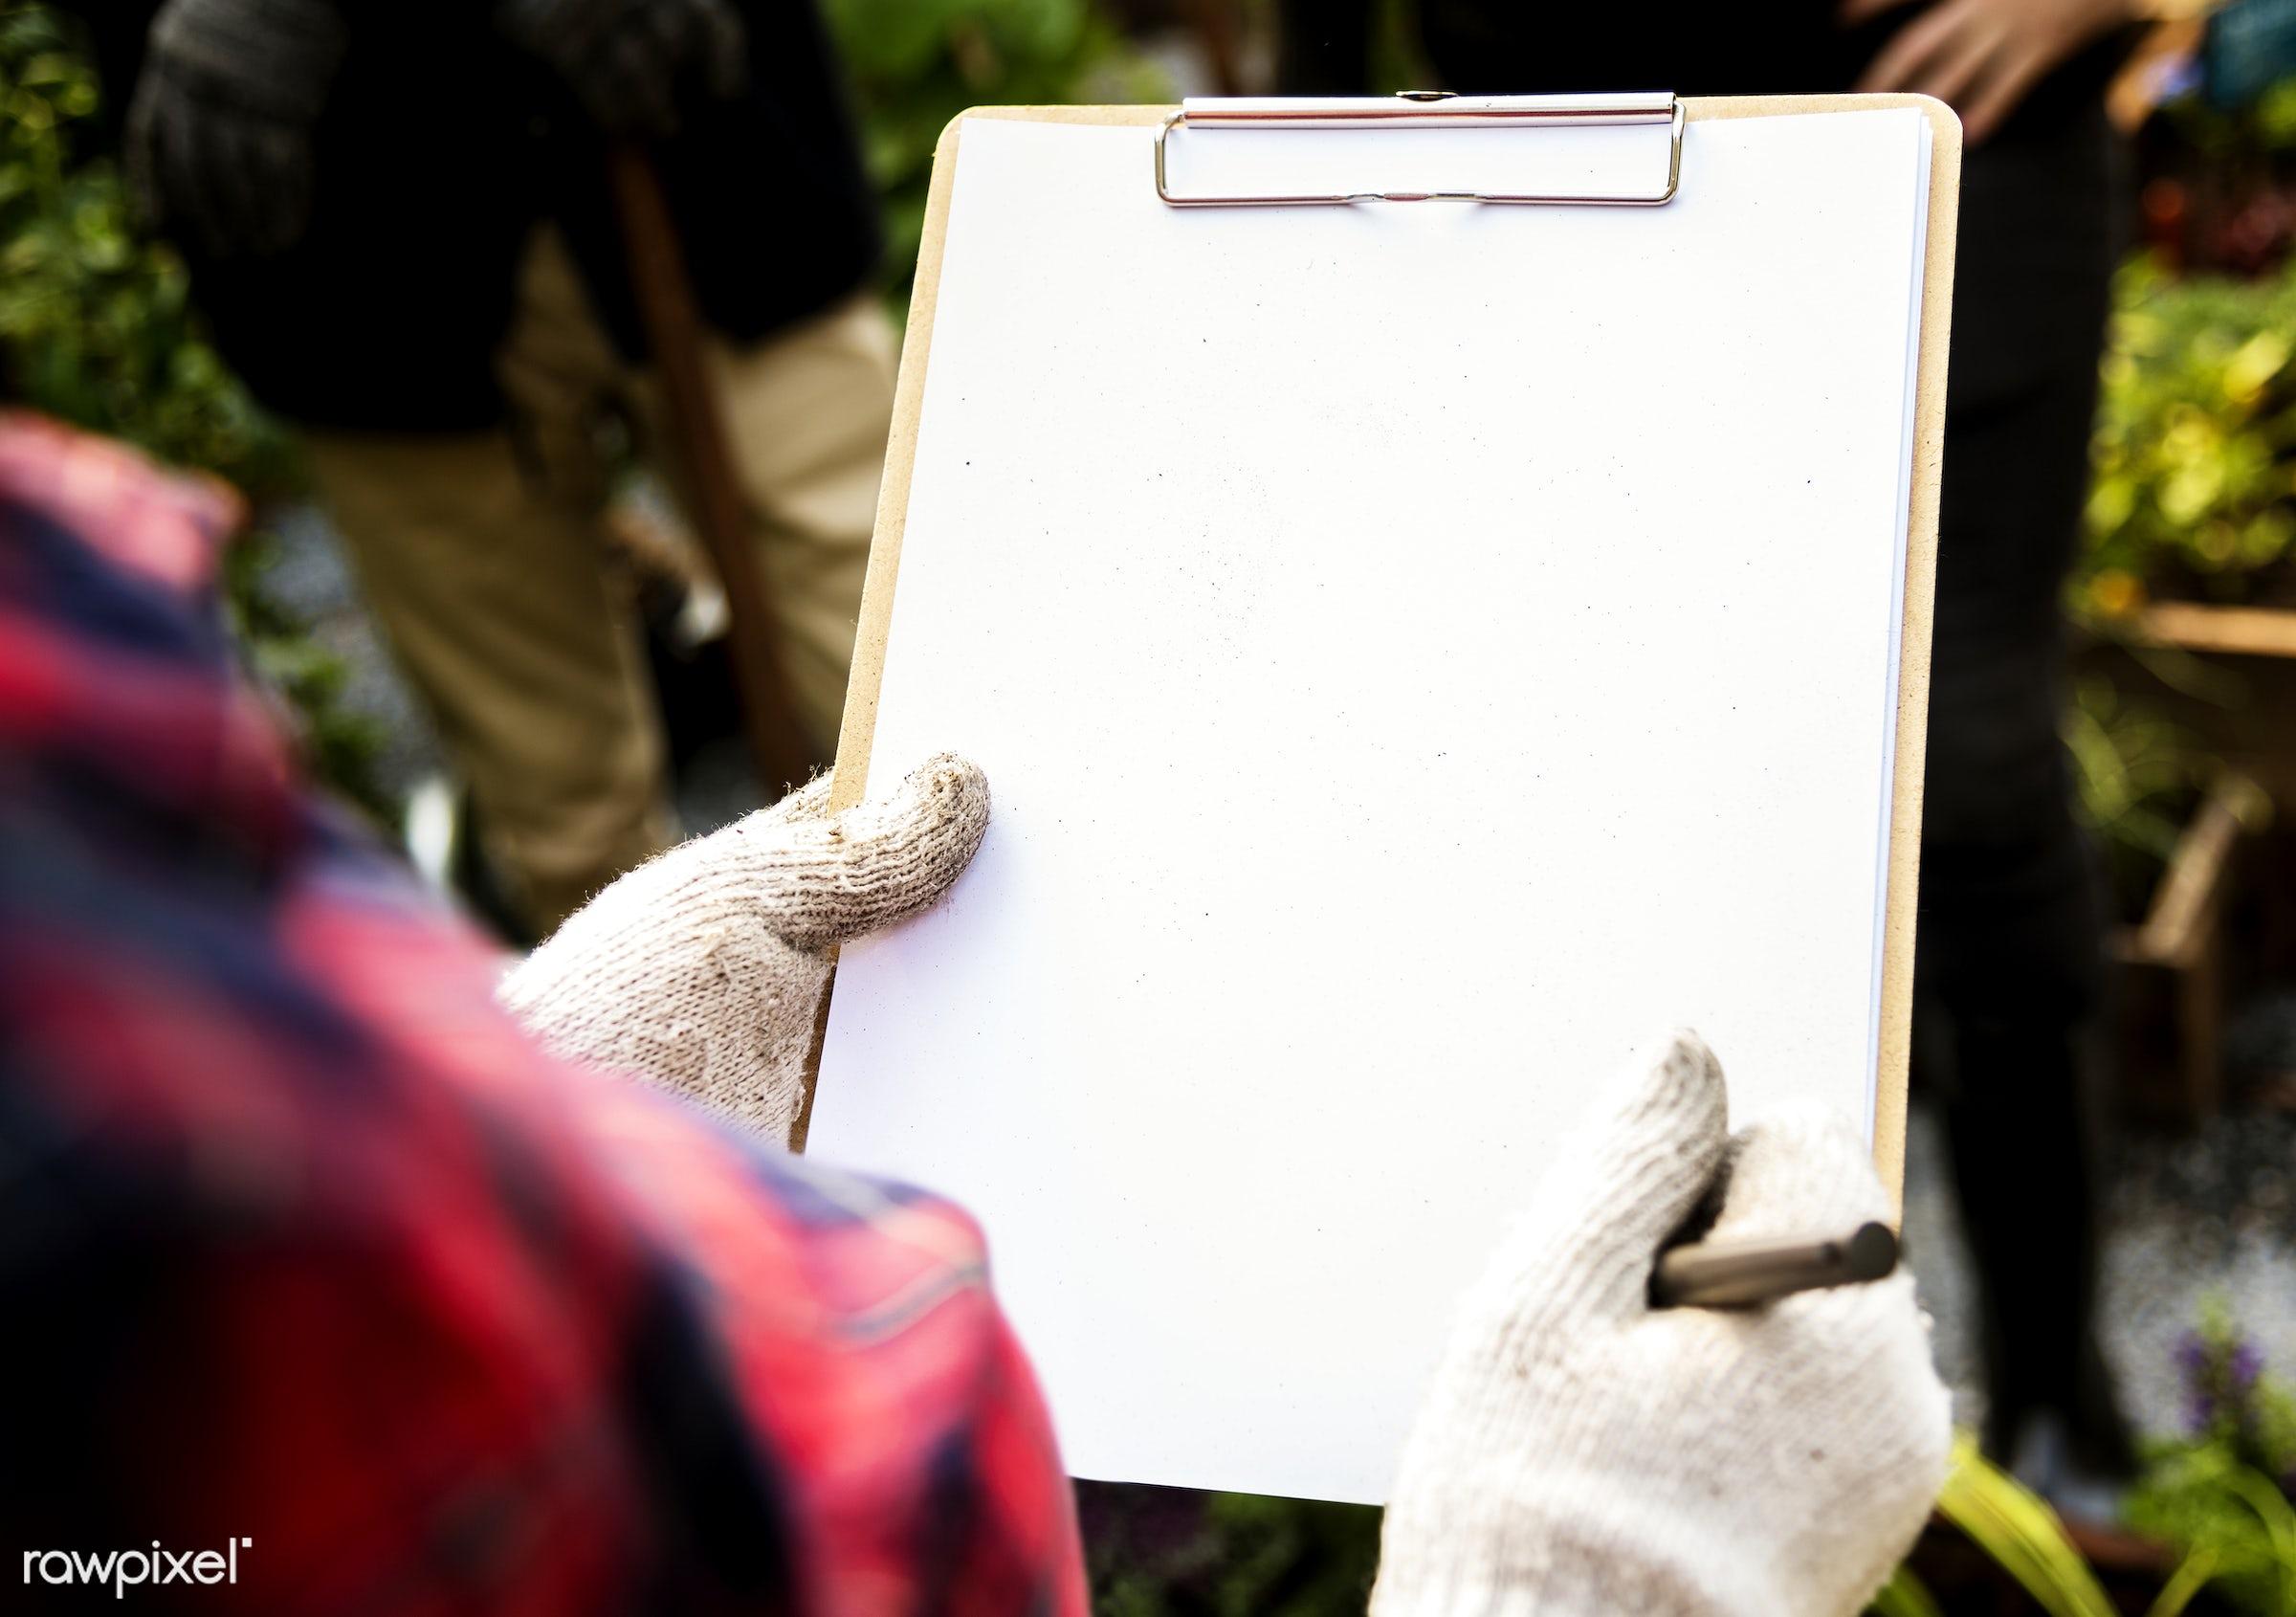 farmer, adult, agricultural, agriculture, backyard garden, blank, checking, checklist, clipboard, copy space, fresh,...